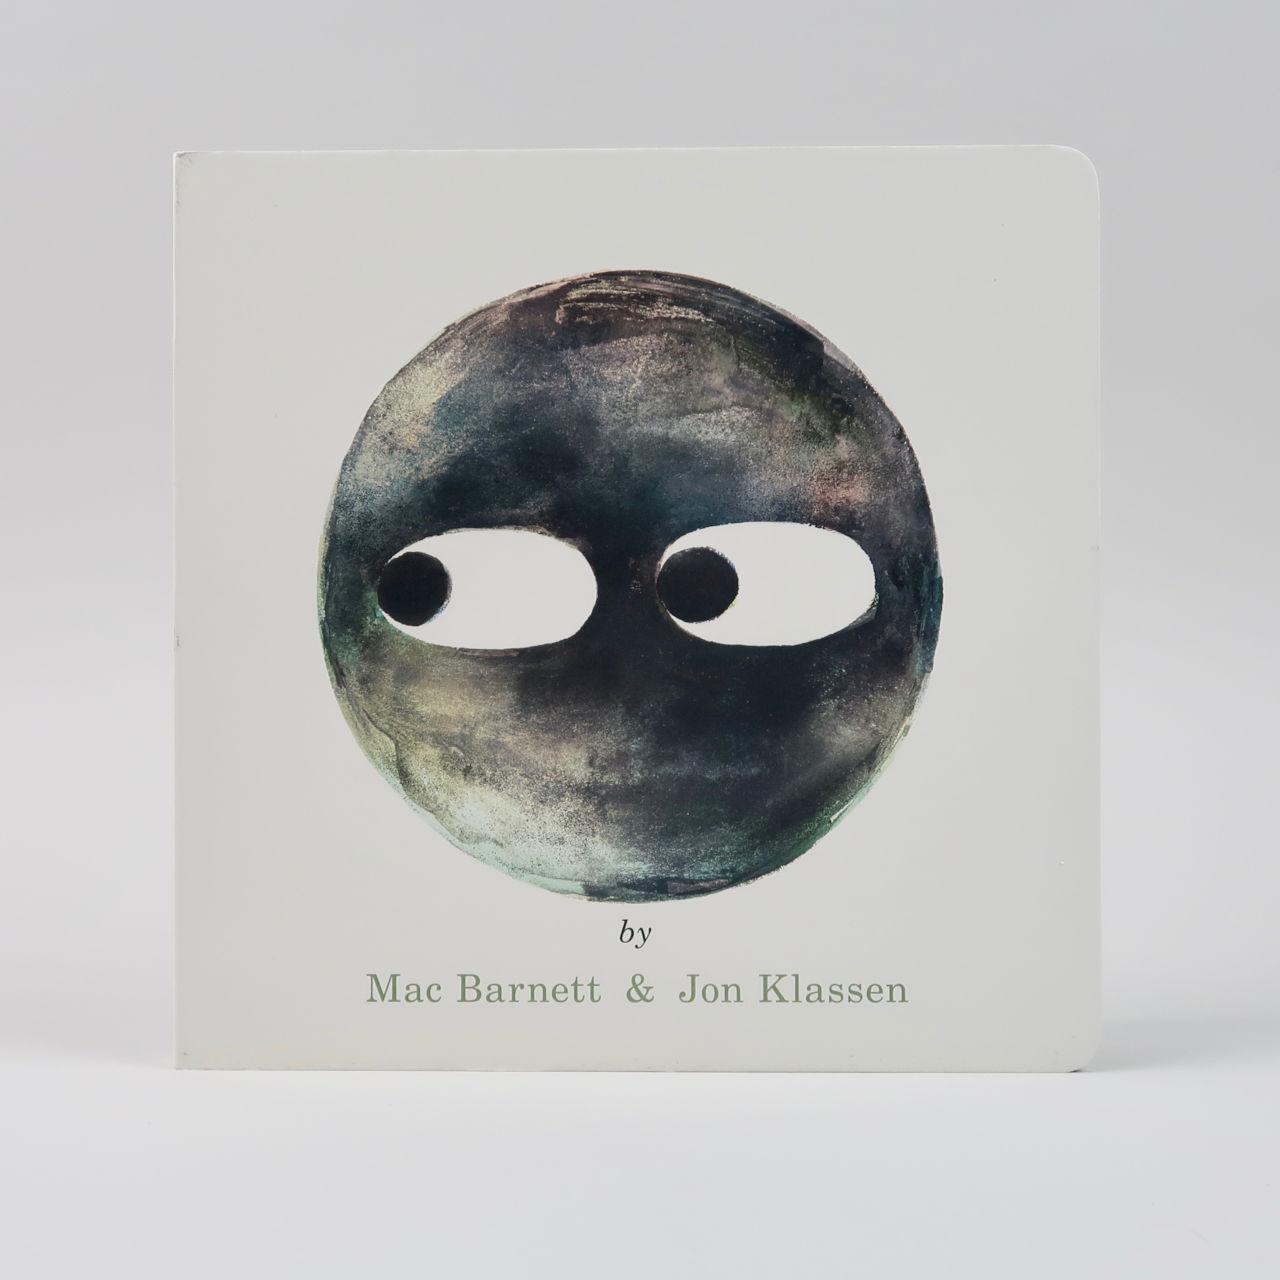 Circle - Mac Barnett & Jon Klassen